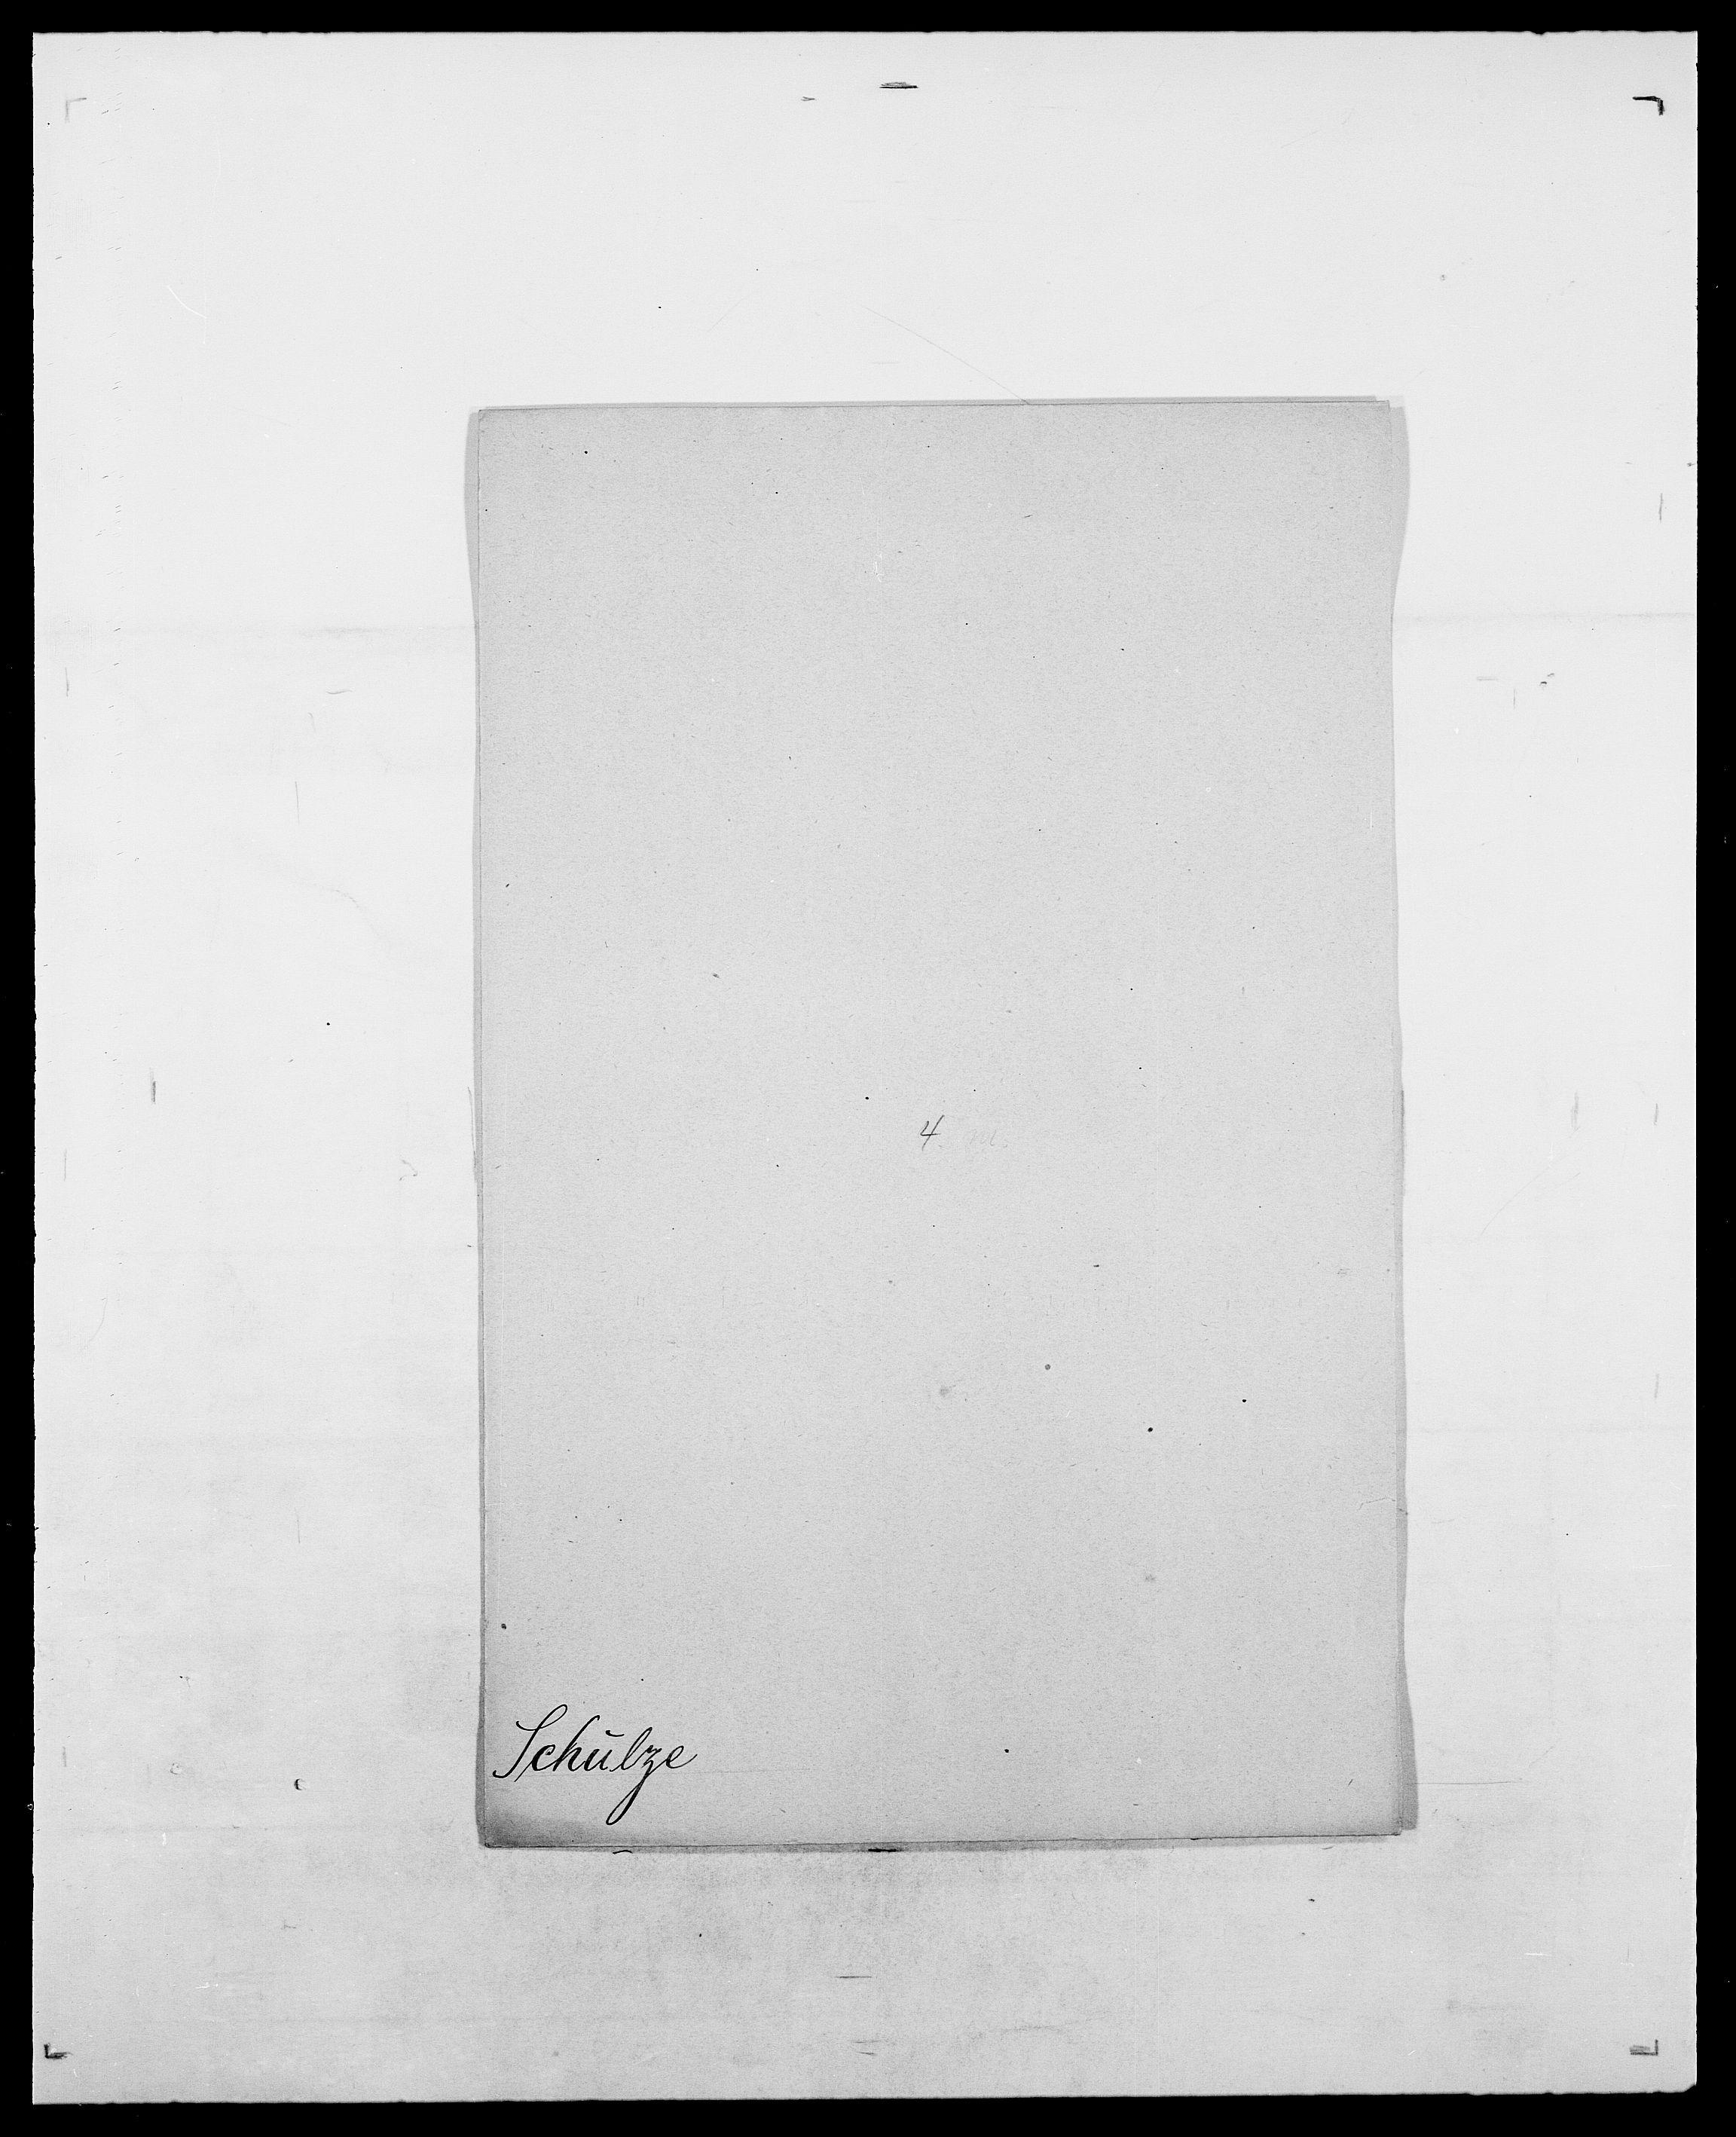 SAO, Delgobe, Charles Antoine - samling, D/Da/L0035: Schnabel - sjetman, s. 336